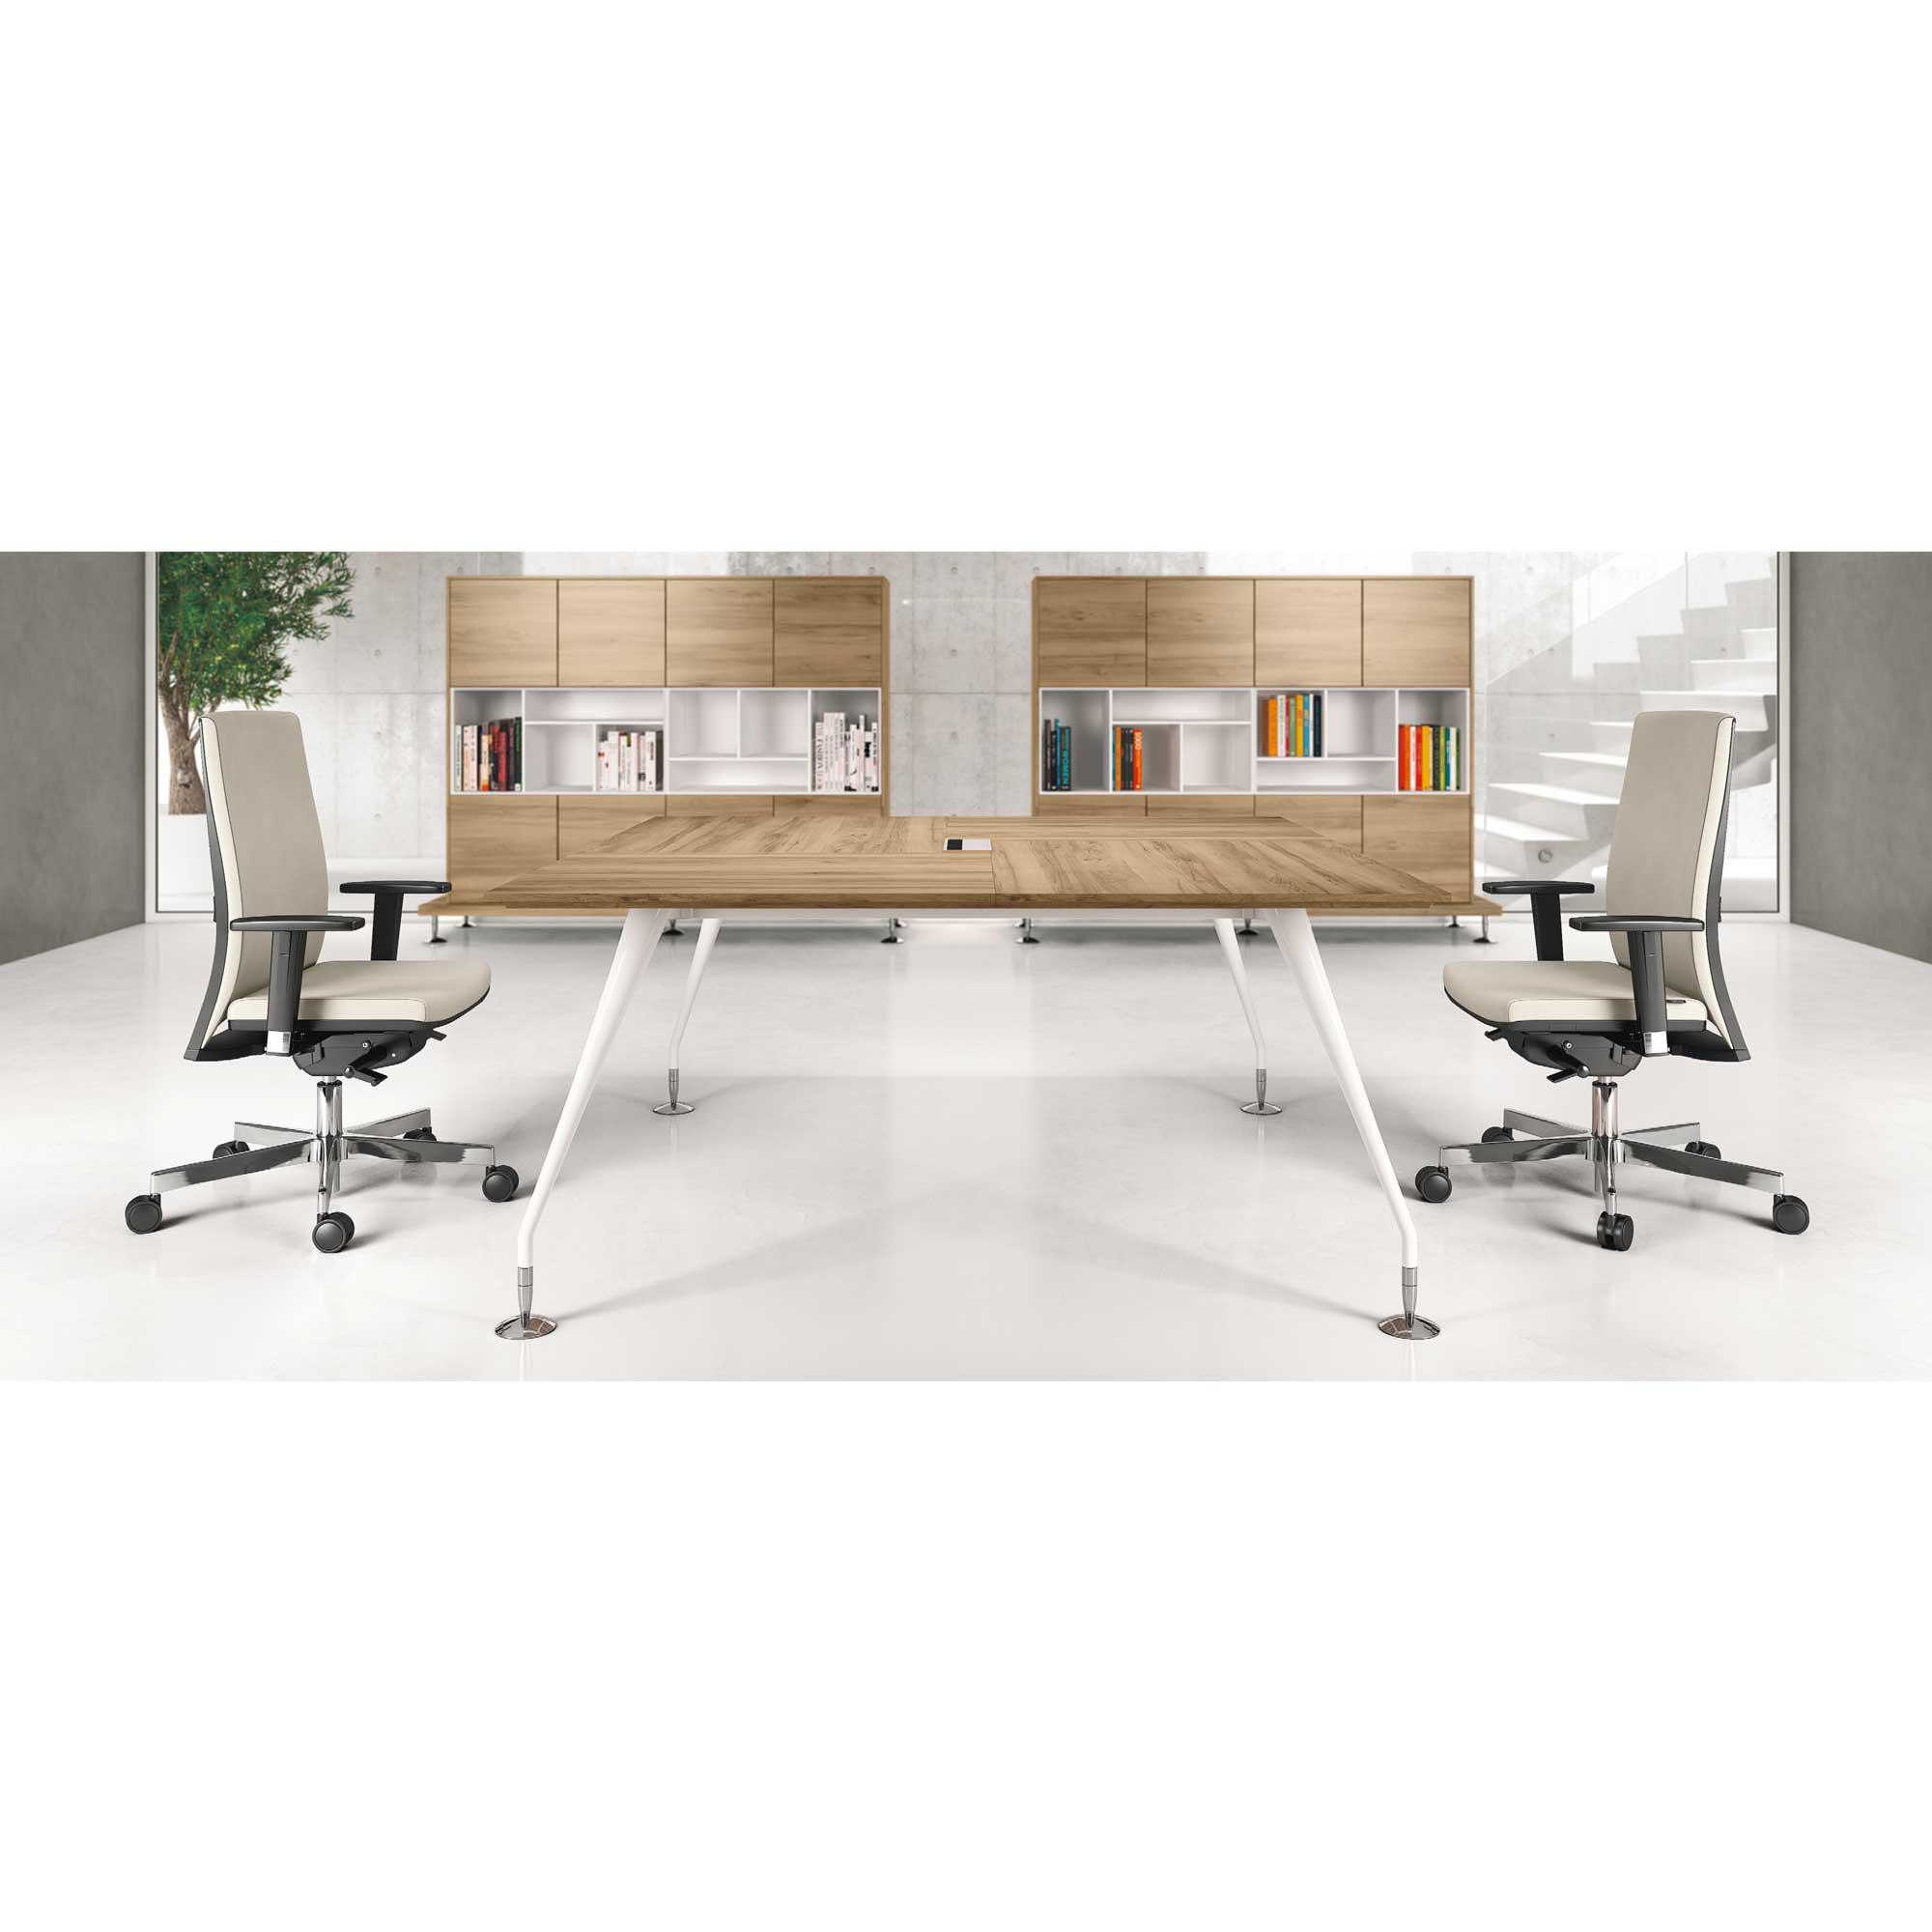 Mobili ufficio catania free arredamento mobili per - Offerte mobili catania ...